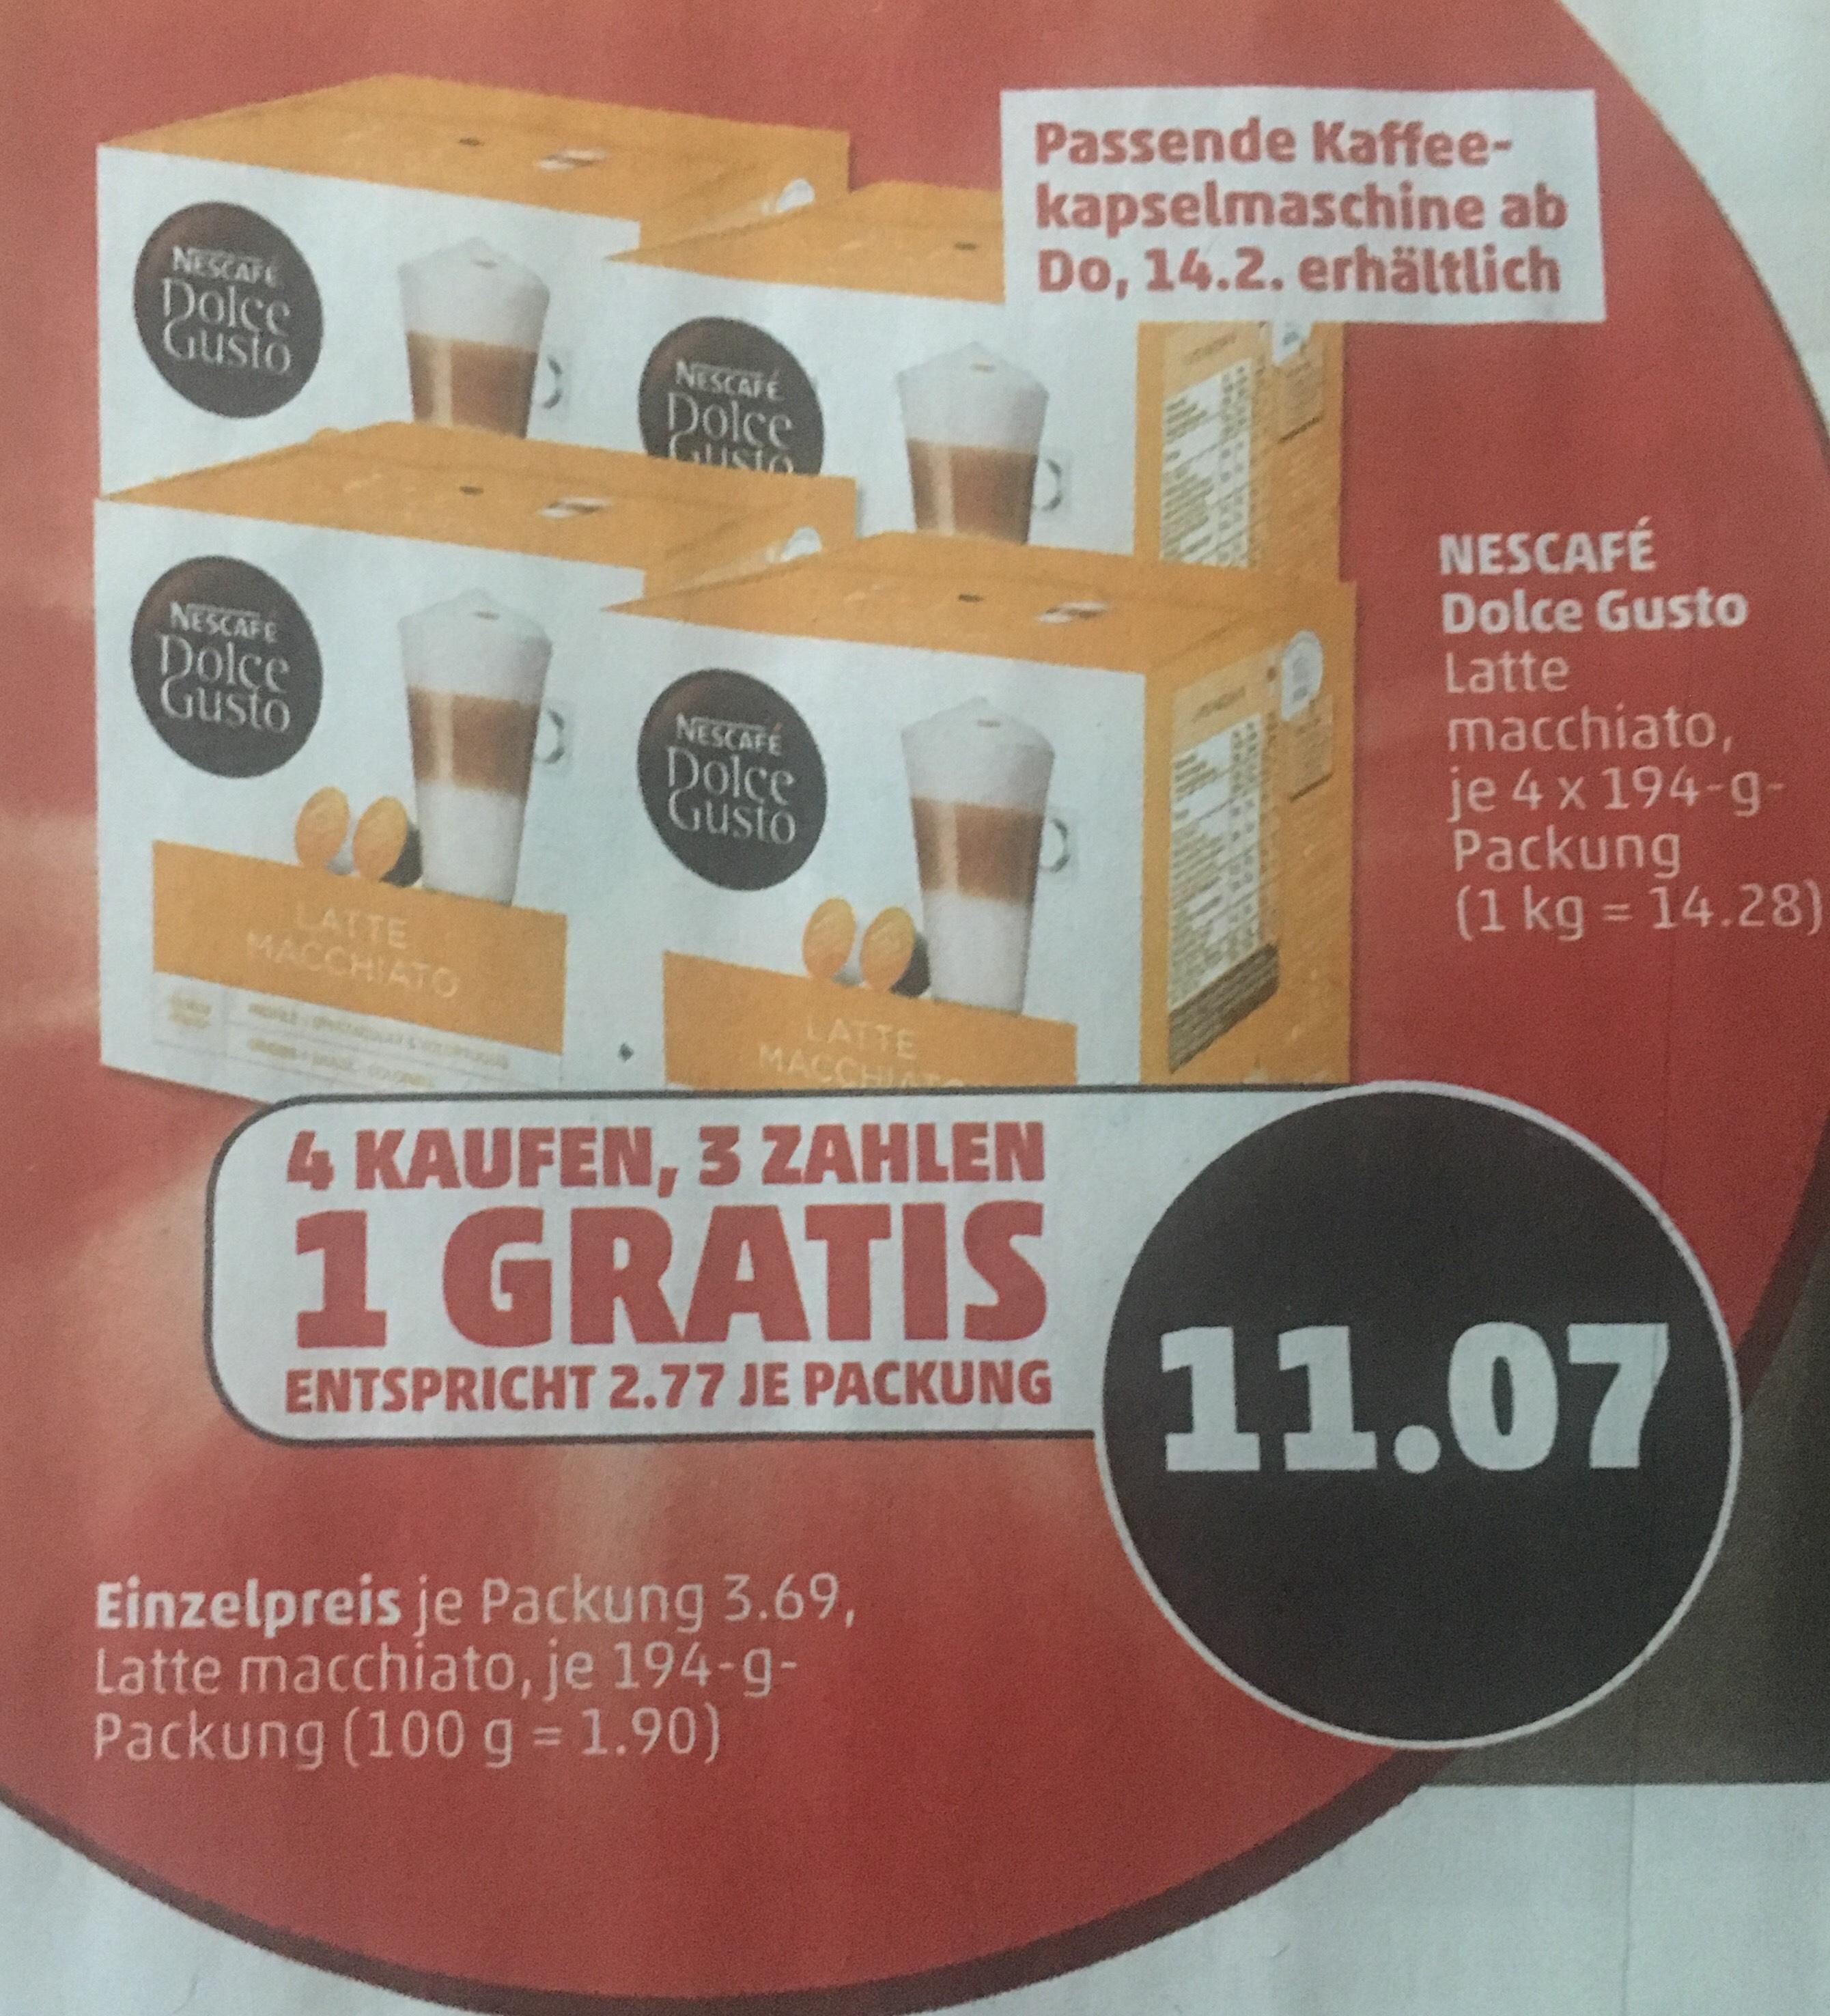 [Penny] Dolce Gusto Kaffeekapseln 4 für 3 Stückpreis 2,77€